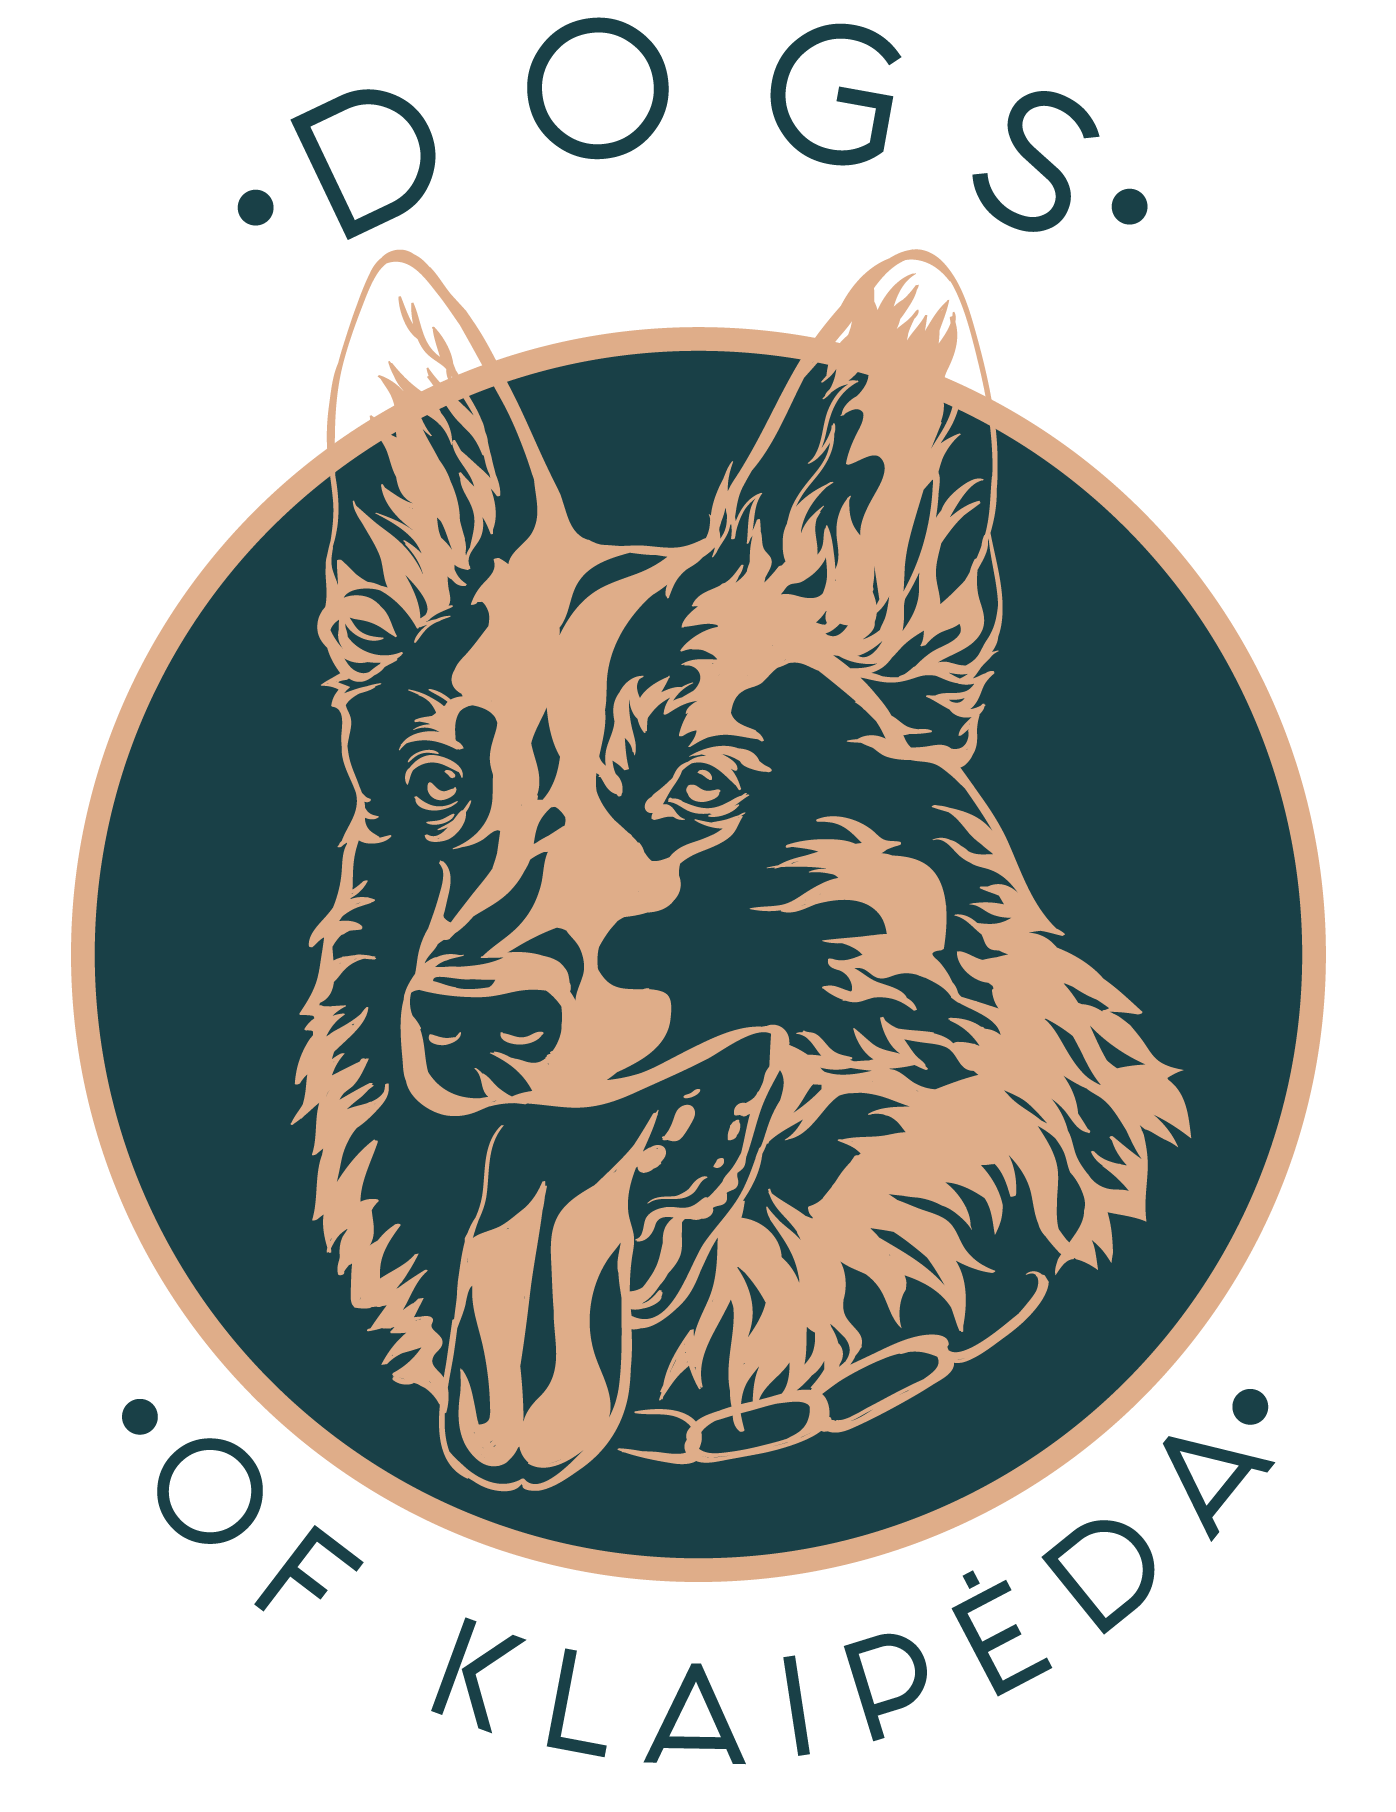 Dogs of Klaipeda